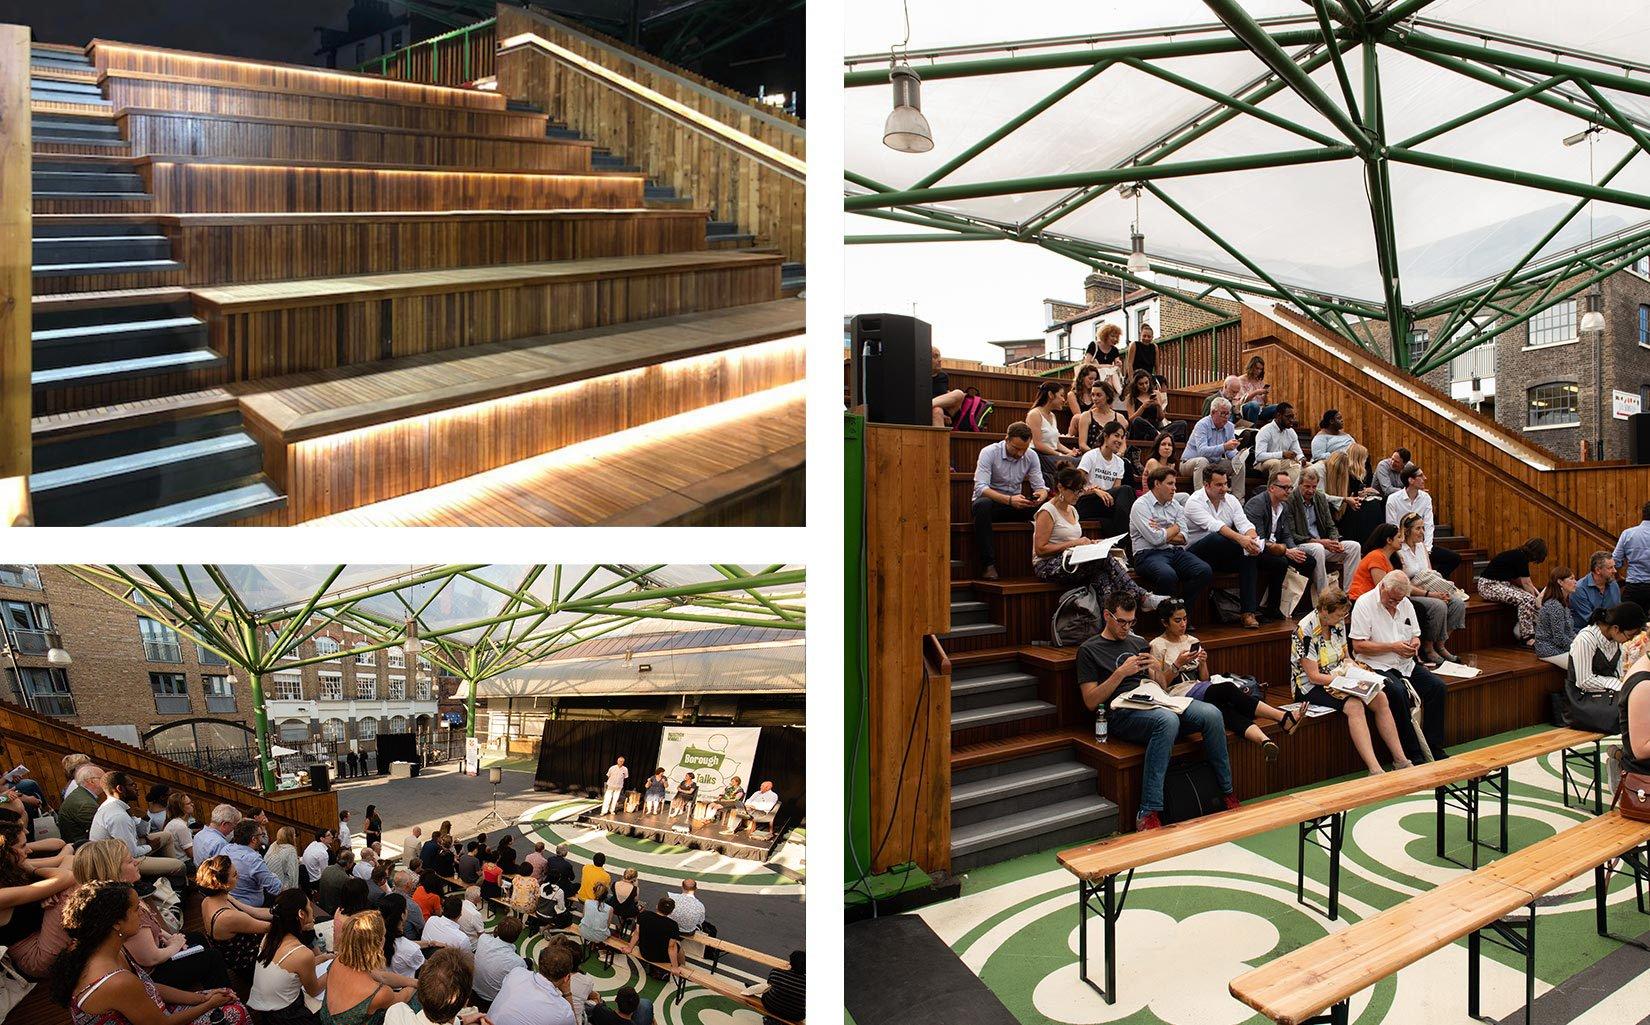 Jubilee Place, Borough Market, London, Podium now open